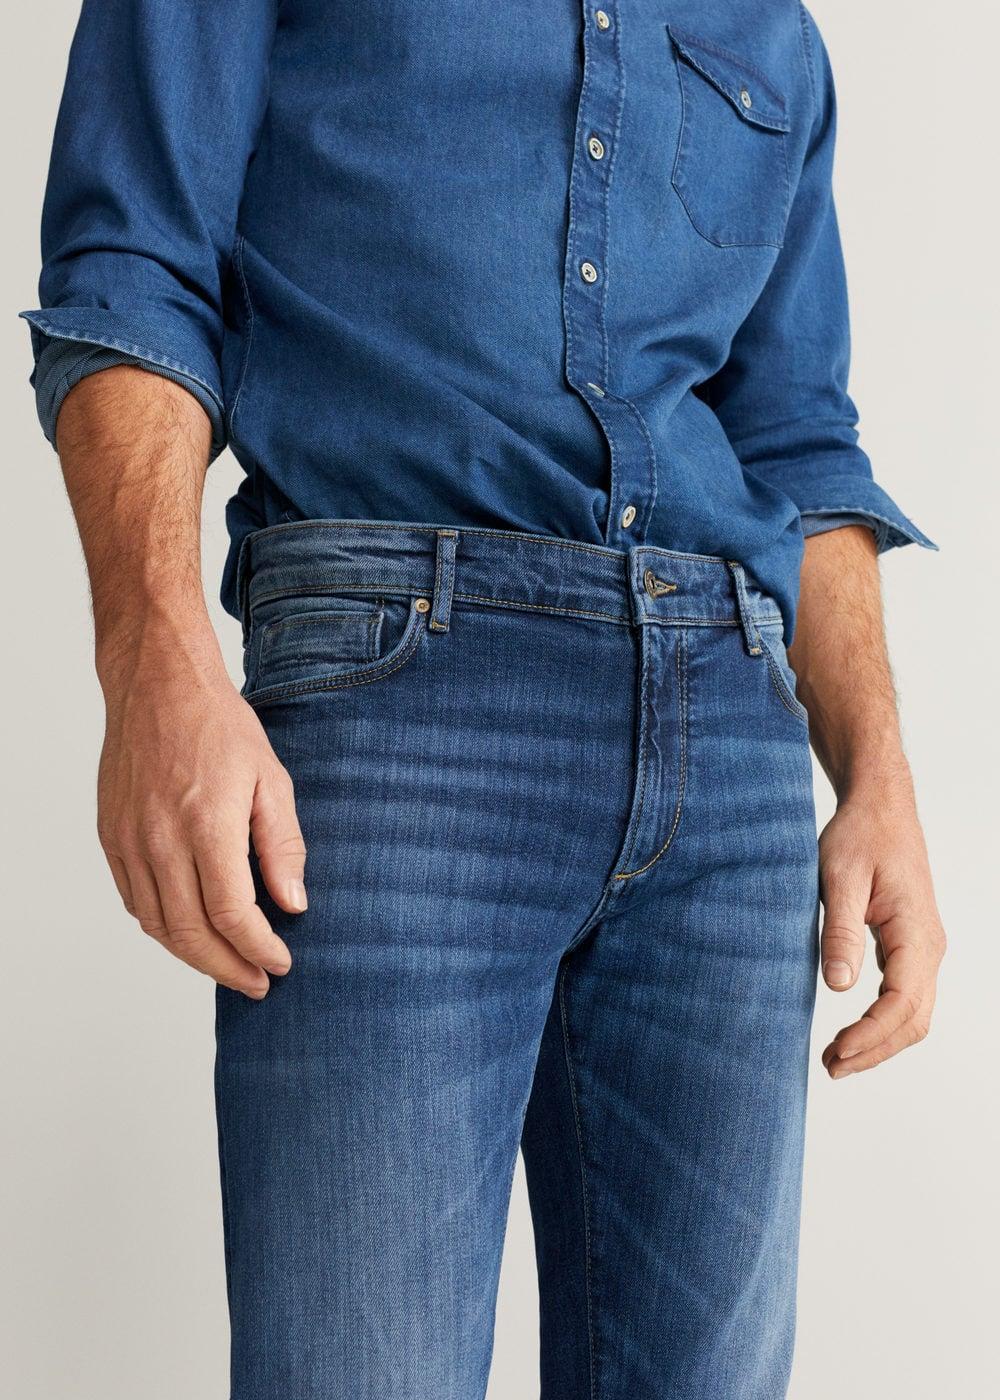 h-tim:jeans tim slim fit lavado medio